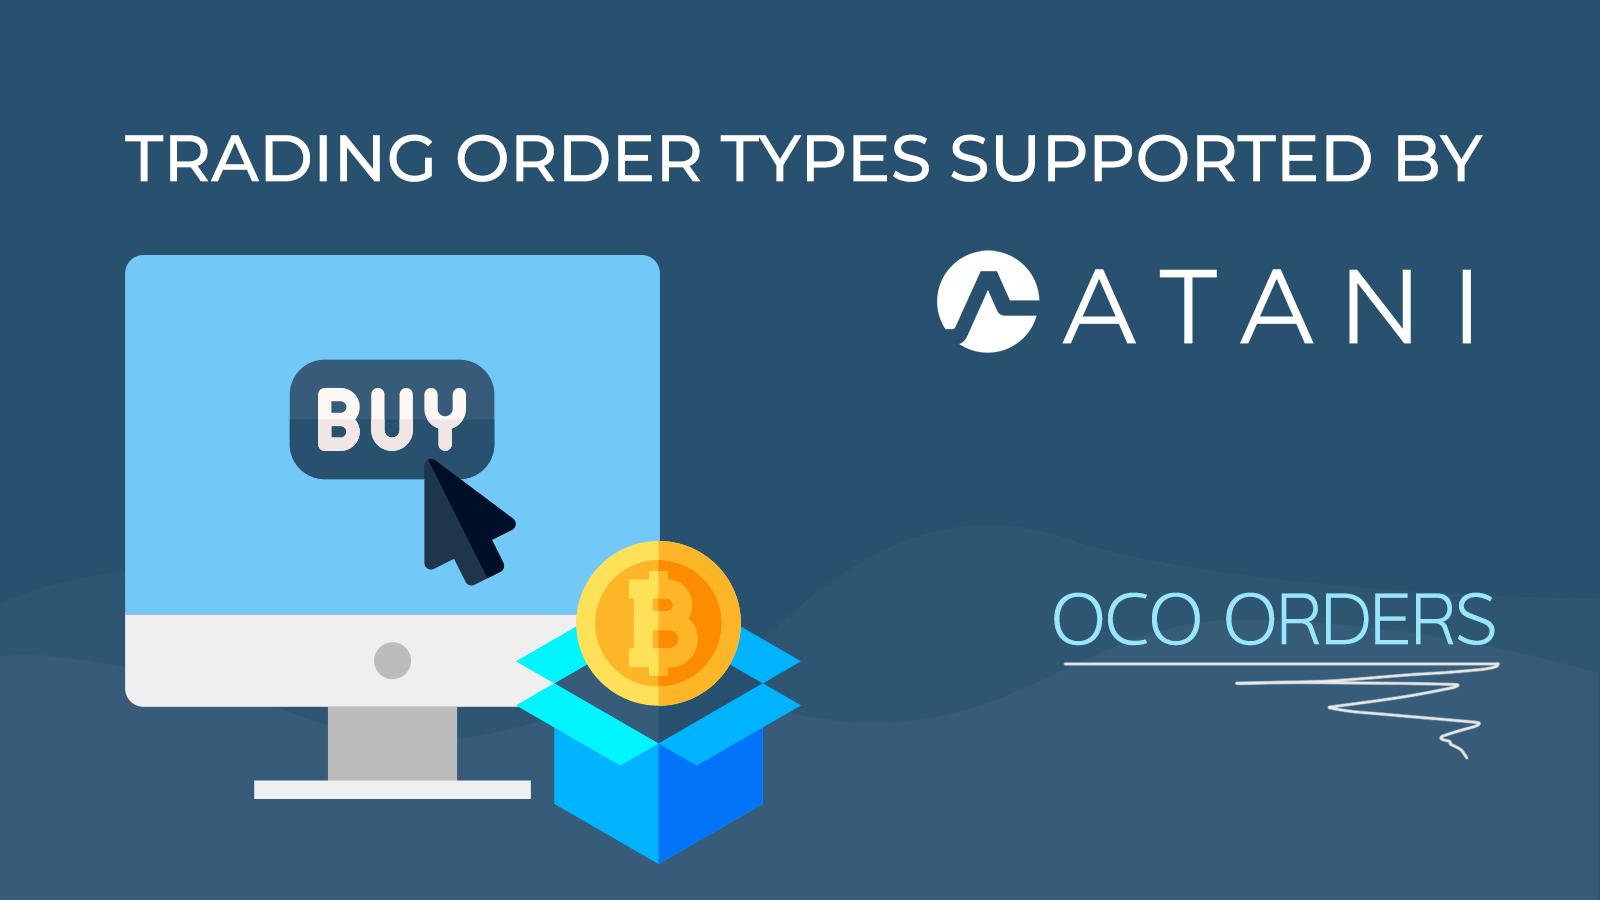 OCO Order in Atani